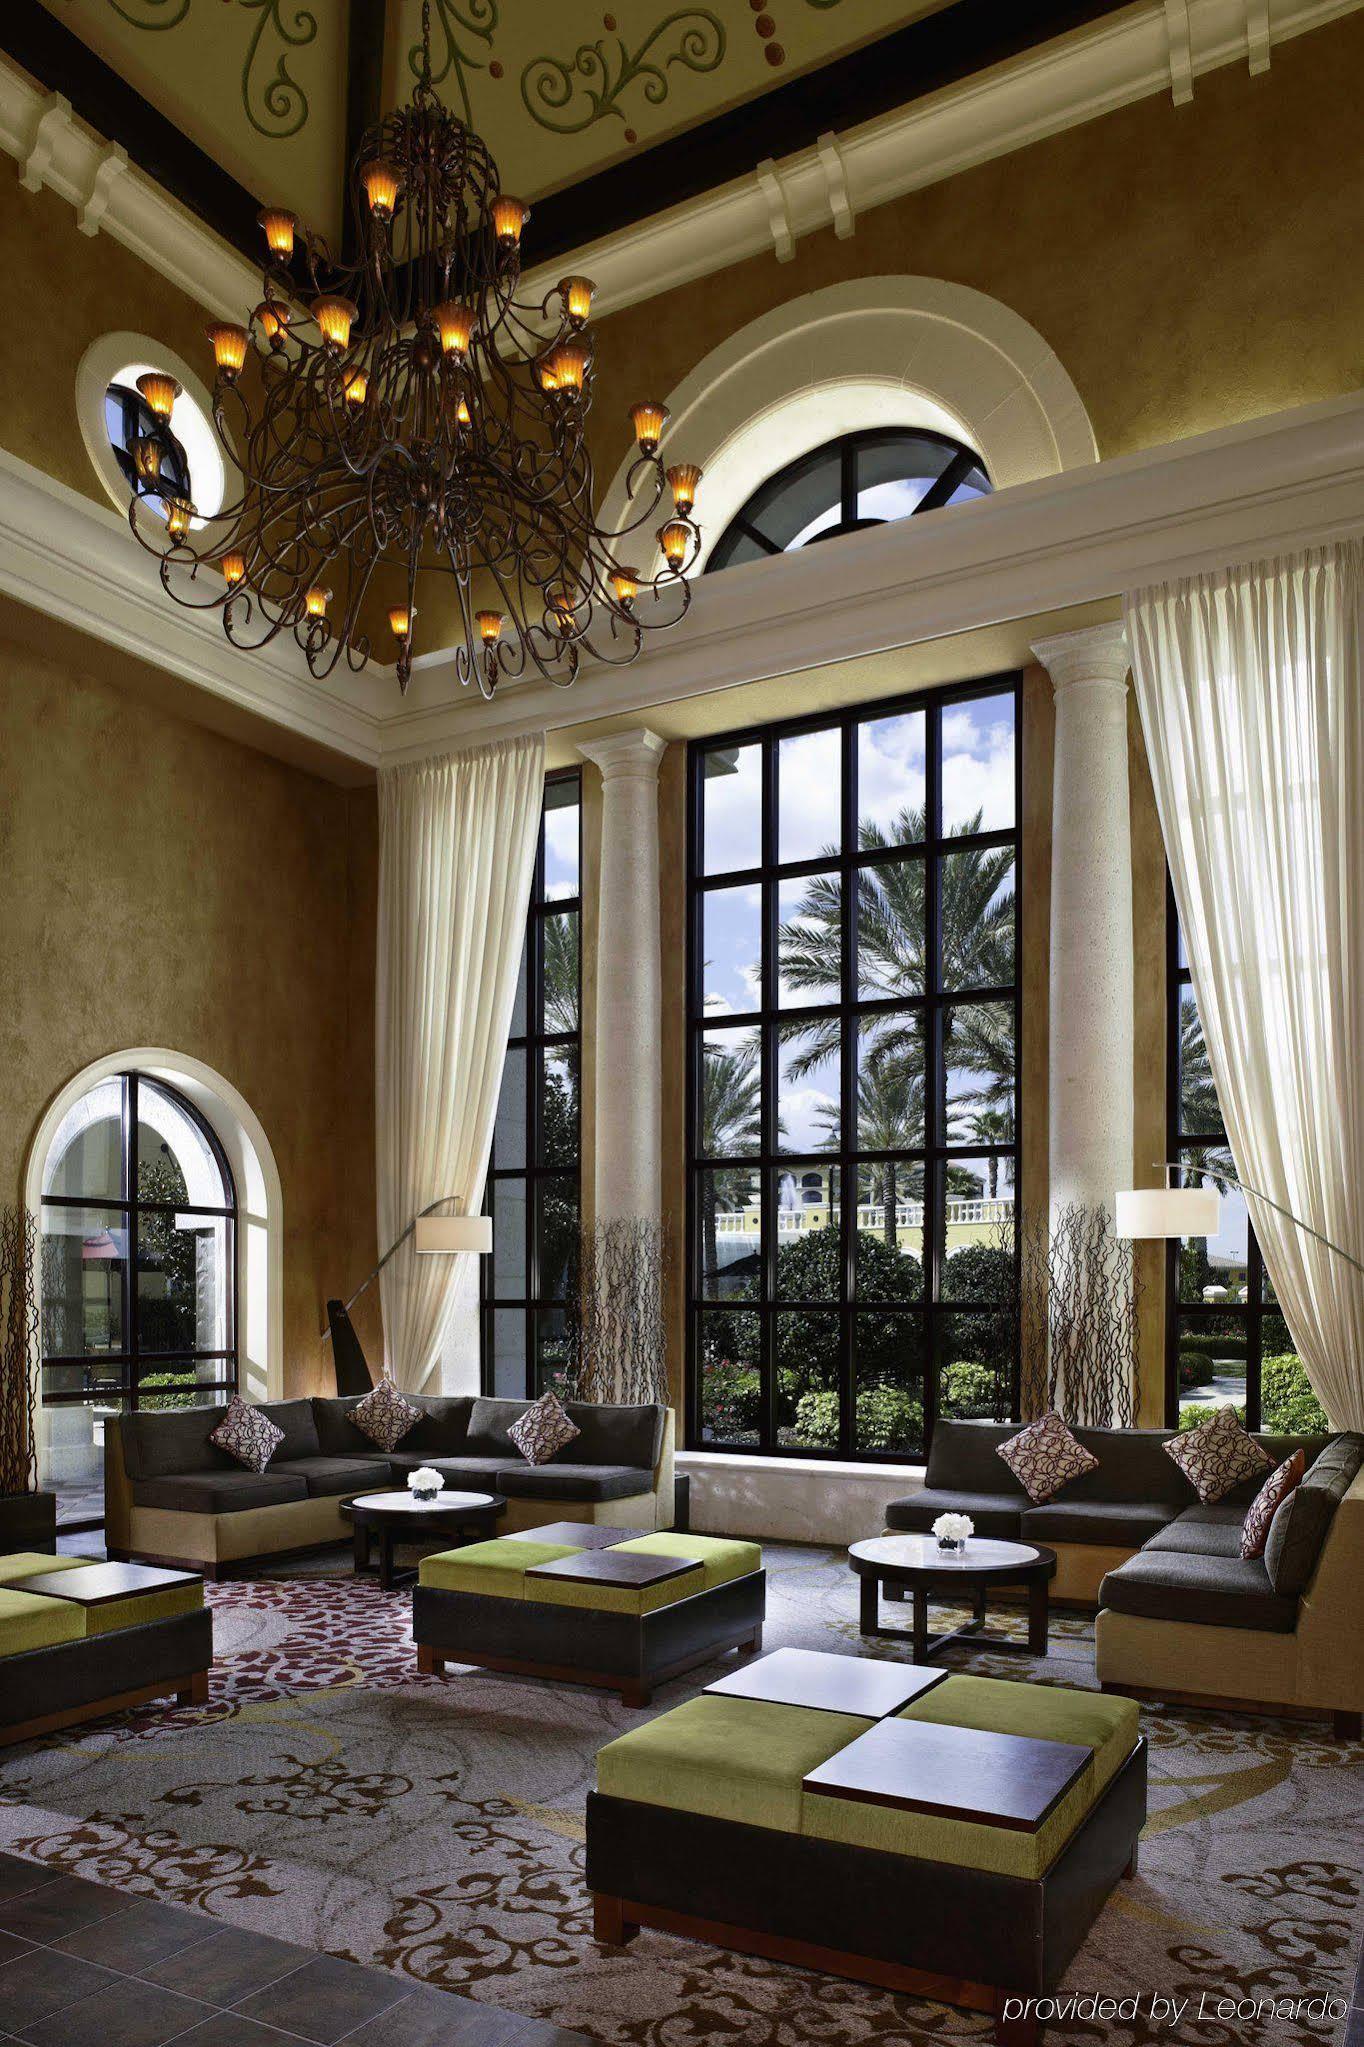 Hilton Grand Vacations on International Drive